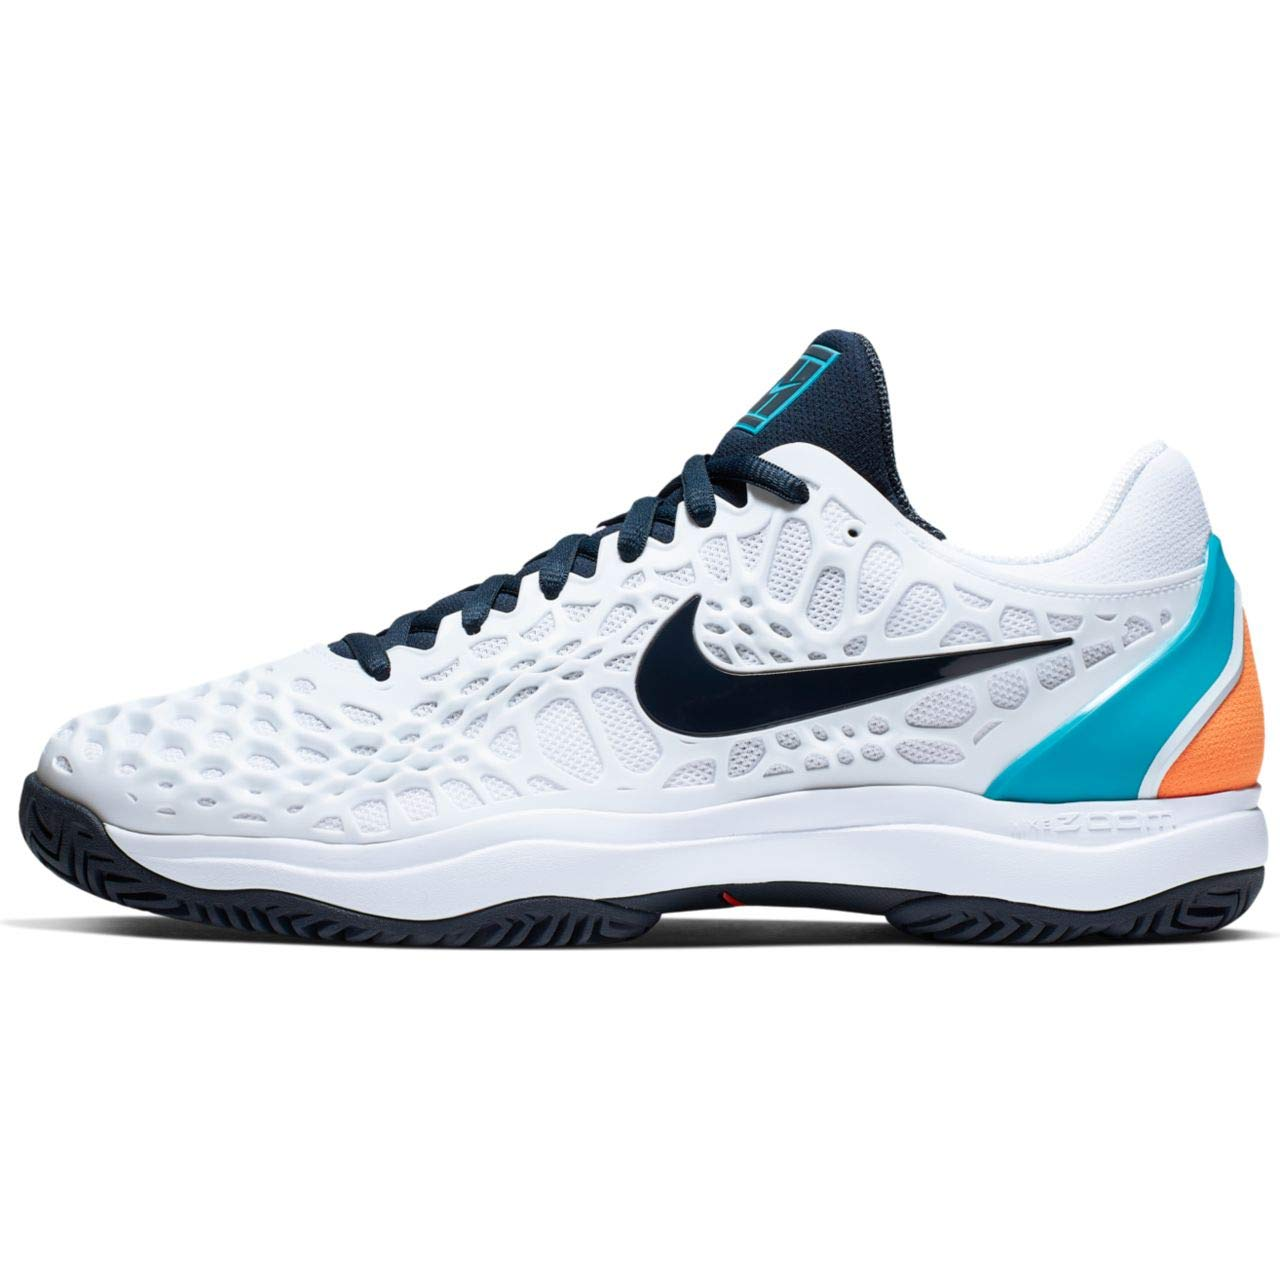 MultiCouleure (blanc Obsidian Light Carbon Lt bleu Fury 000) Nike Air Zoom Cage 3 HC, Chaussures de Tennis Homme 48.5 EU